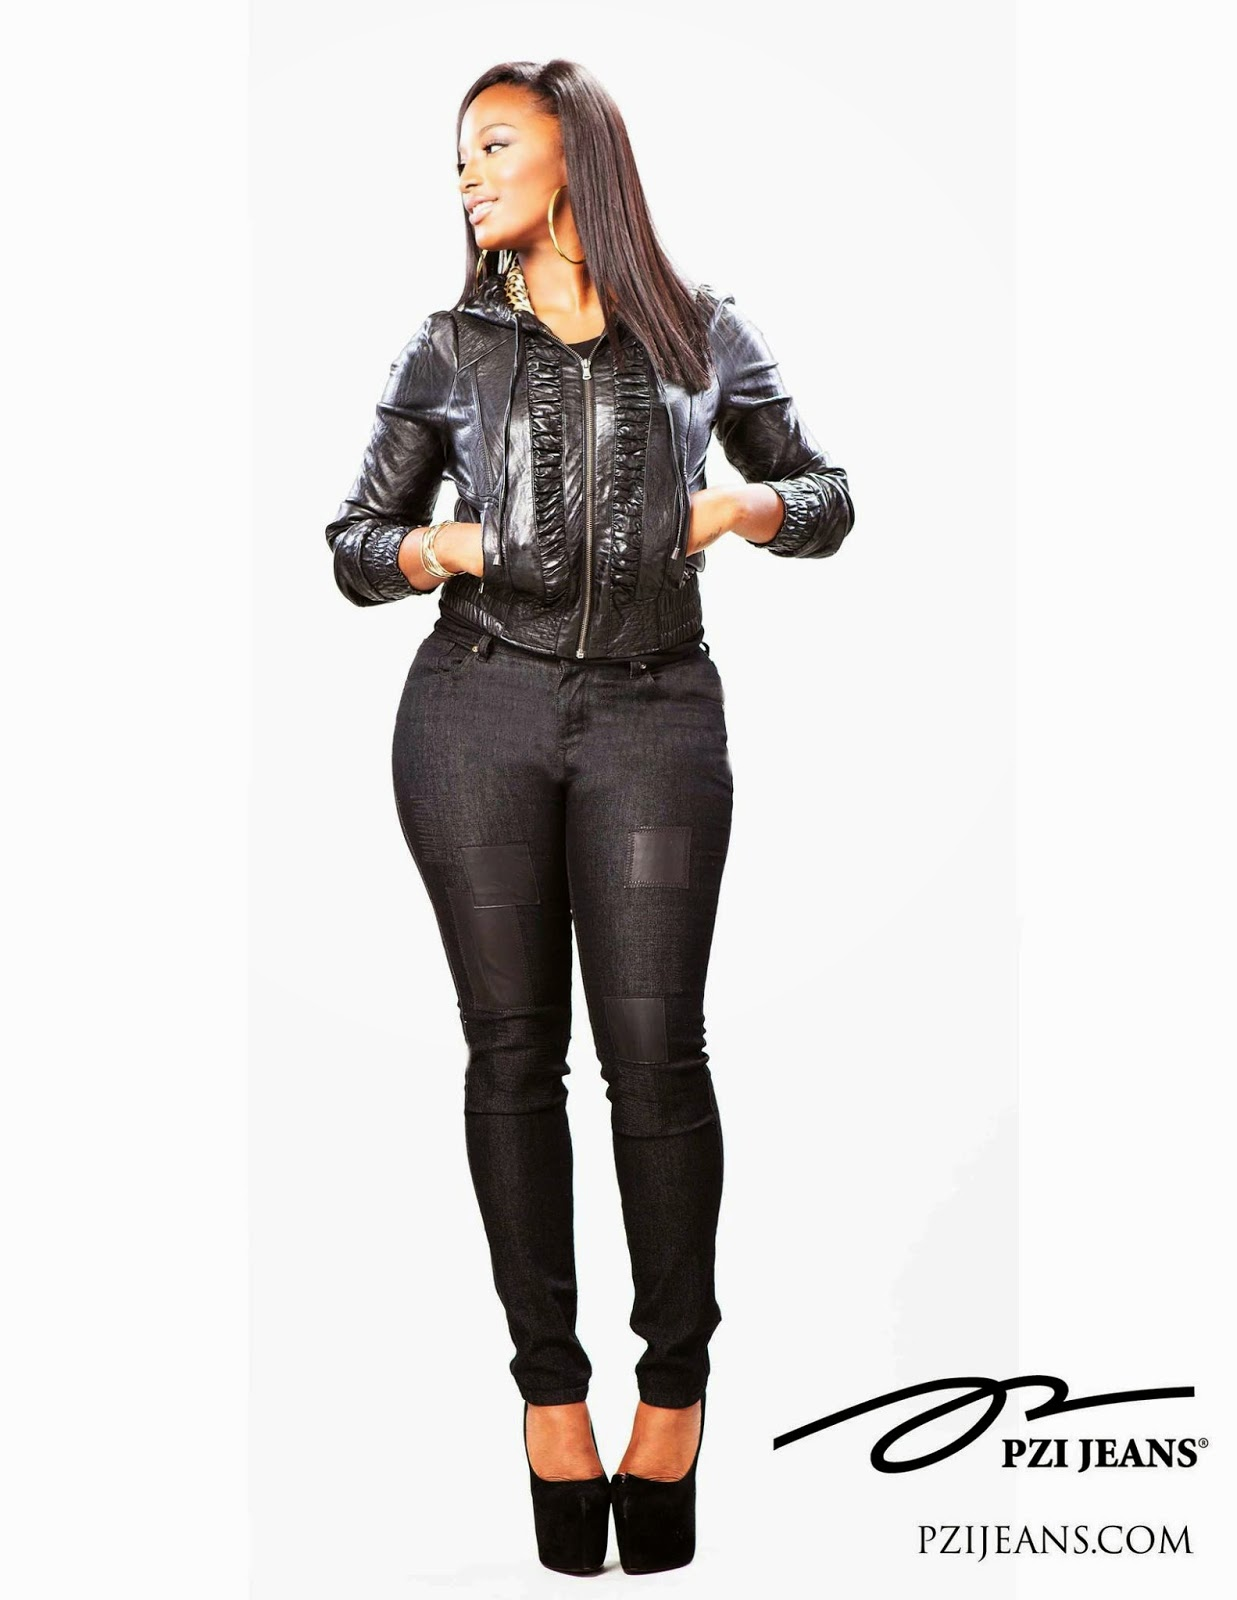 d88eb24e490 Pzi Jeans Introduces New Denim Styles   The Hype Magazine 24/7 News